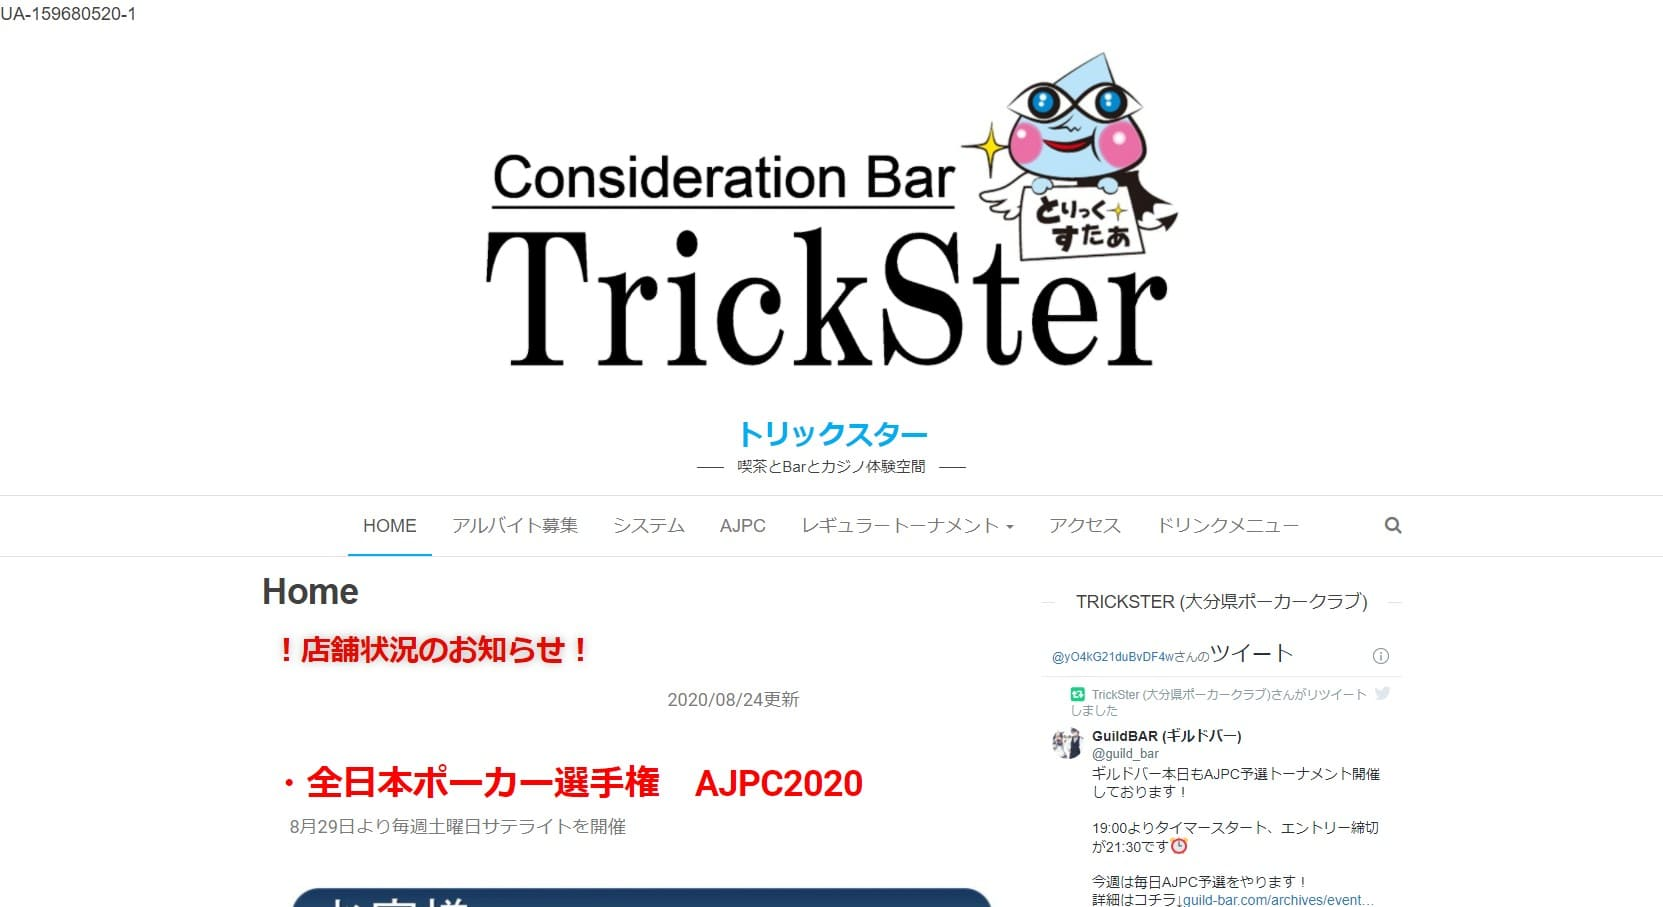 TrickSterのウェブサイト画像。